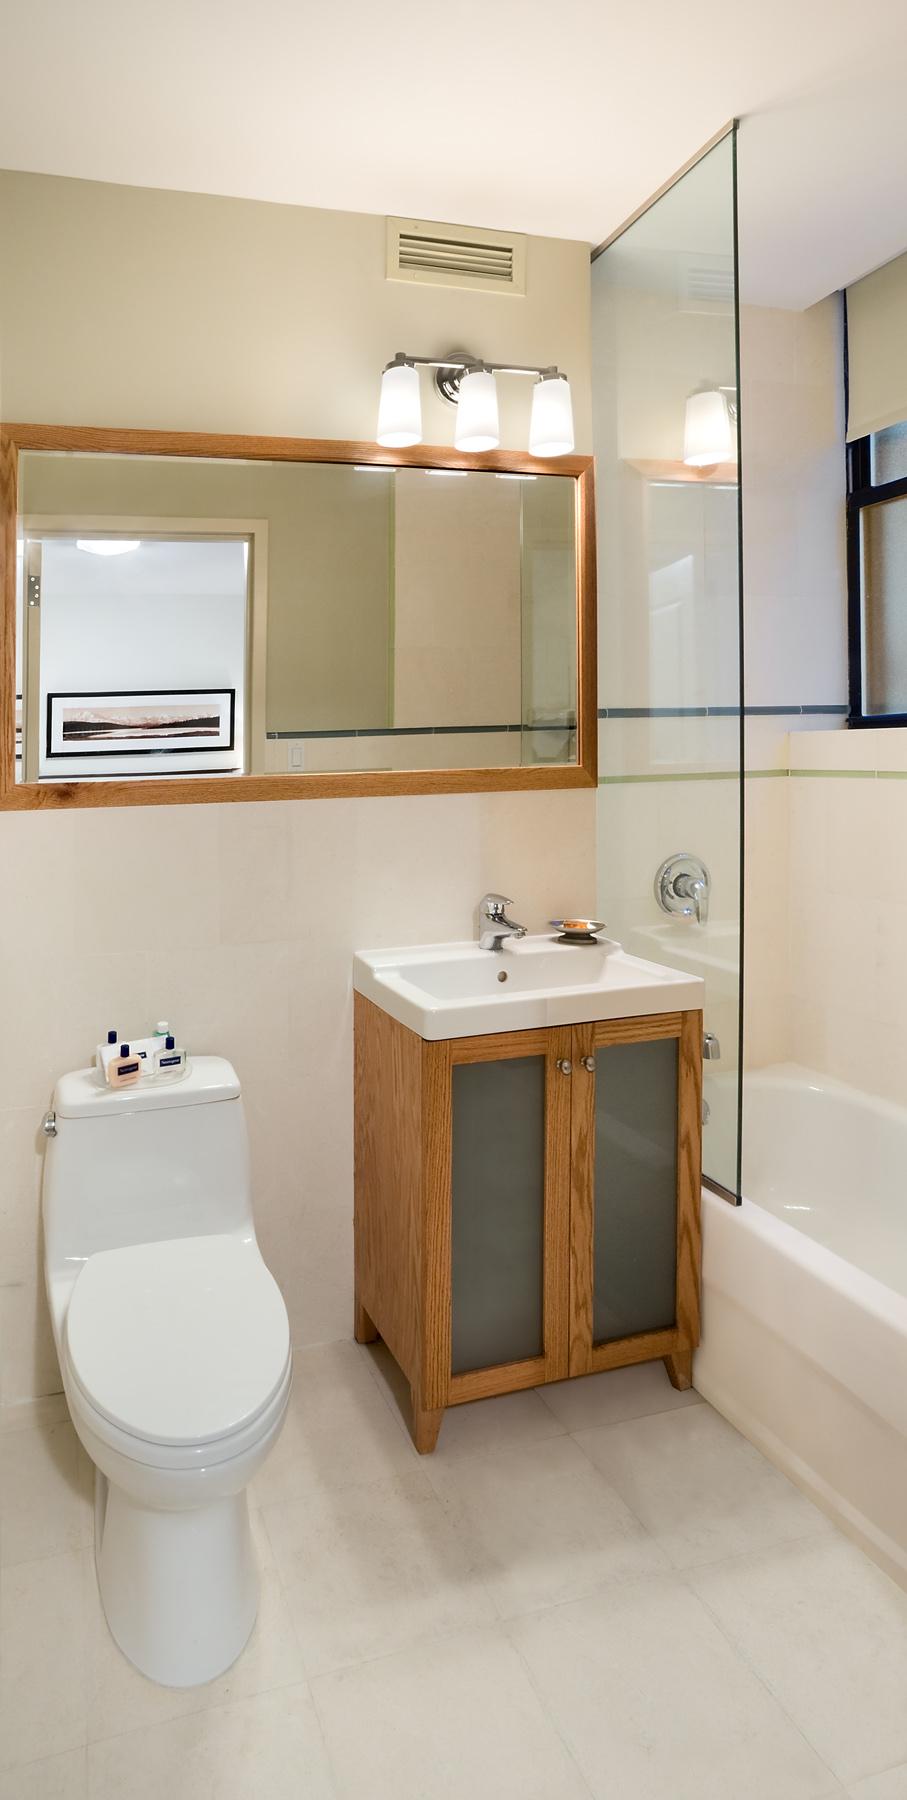 Tobin Parnes Design. NYC. Hospitality Design. Private Bath.